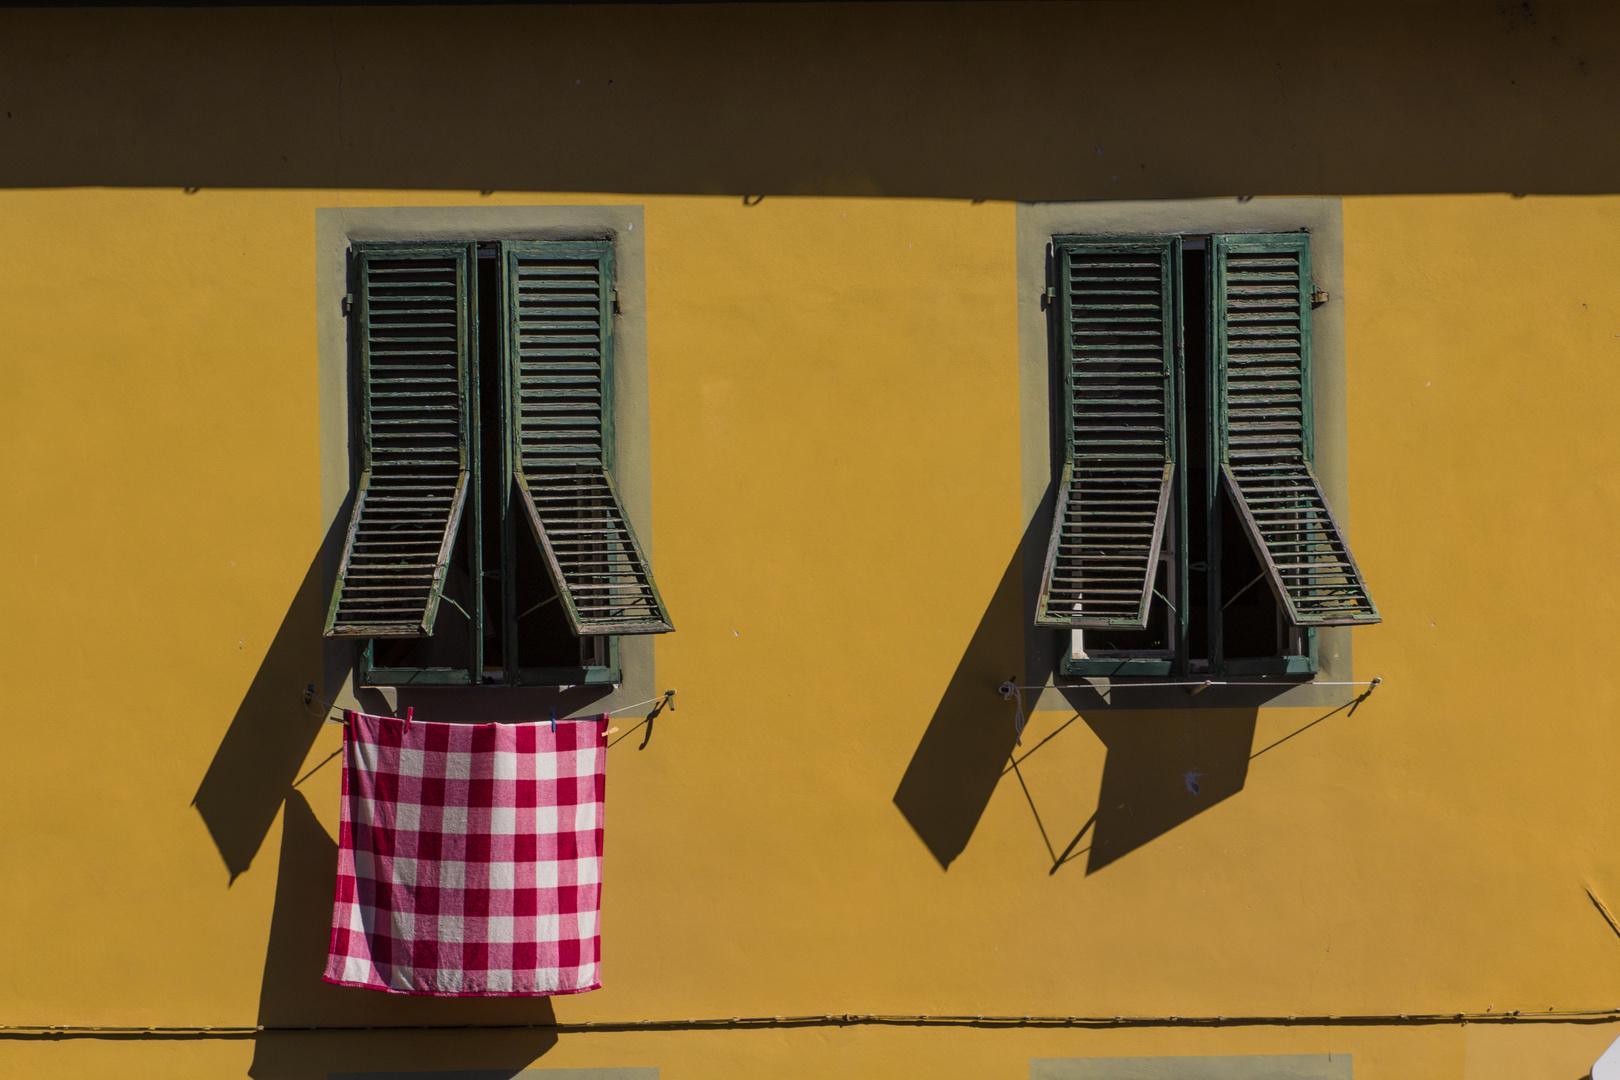 Italien rot - grün - gelb